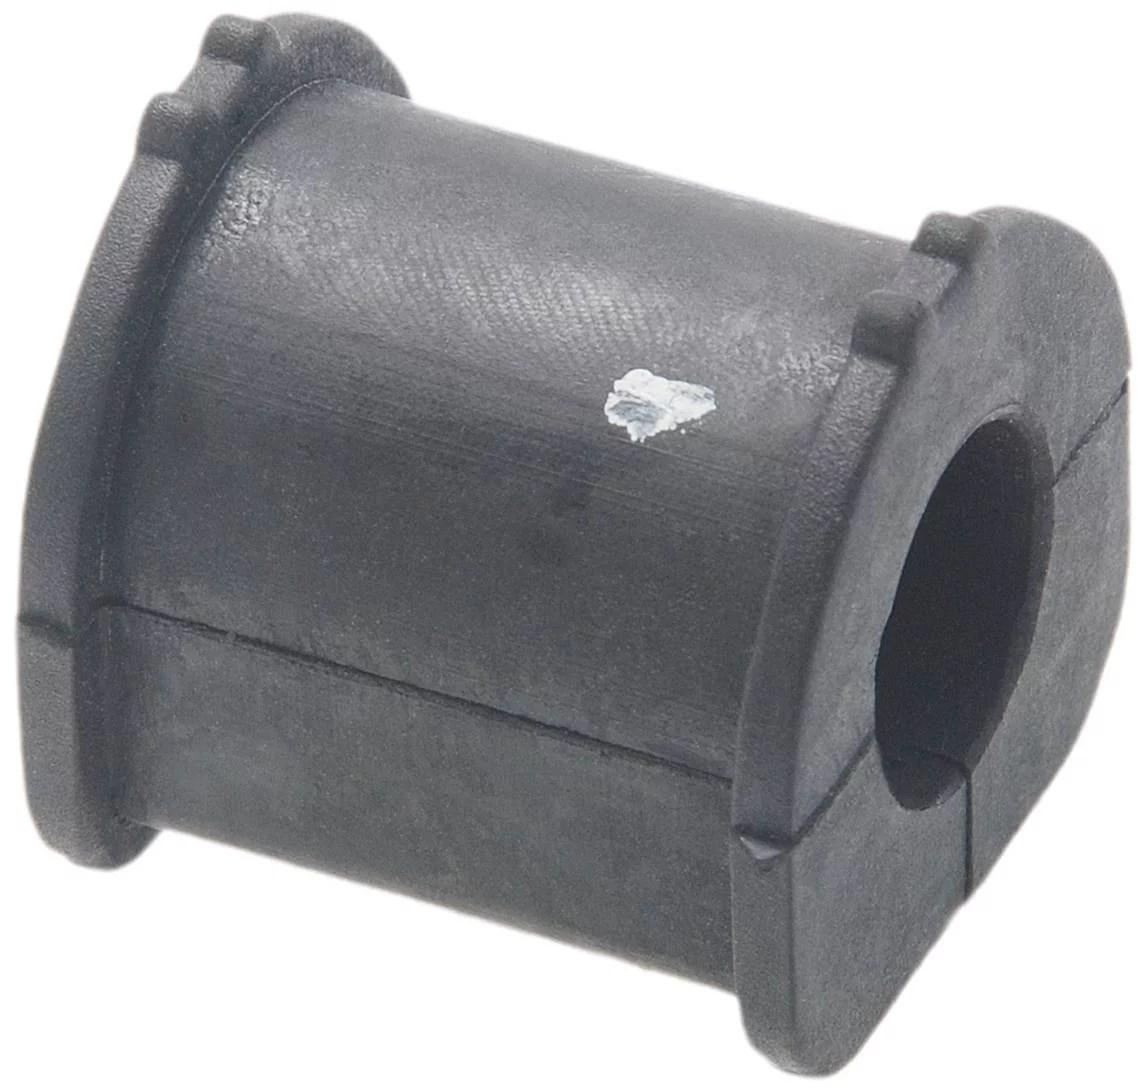 hight resolution of febest szsb swr rear stabilizer bushing d17 suzuki swift sf310 2001 2003 oem 46641 70c00 walmart com